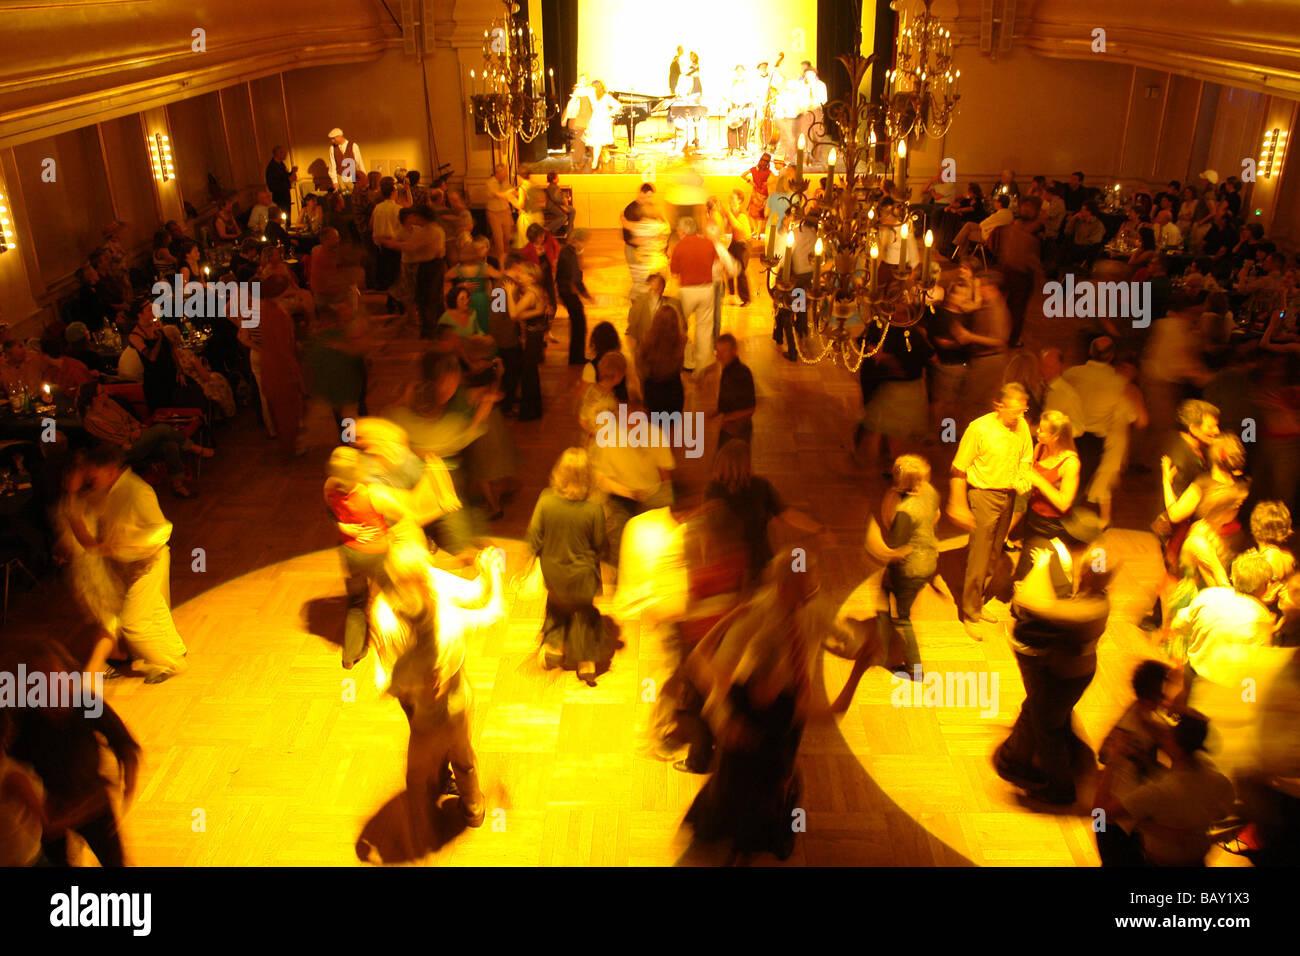 Ballroom dancing at Saalbau, Neukoelln District, Berlin, Germany Stock Photo